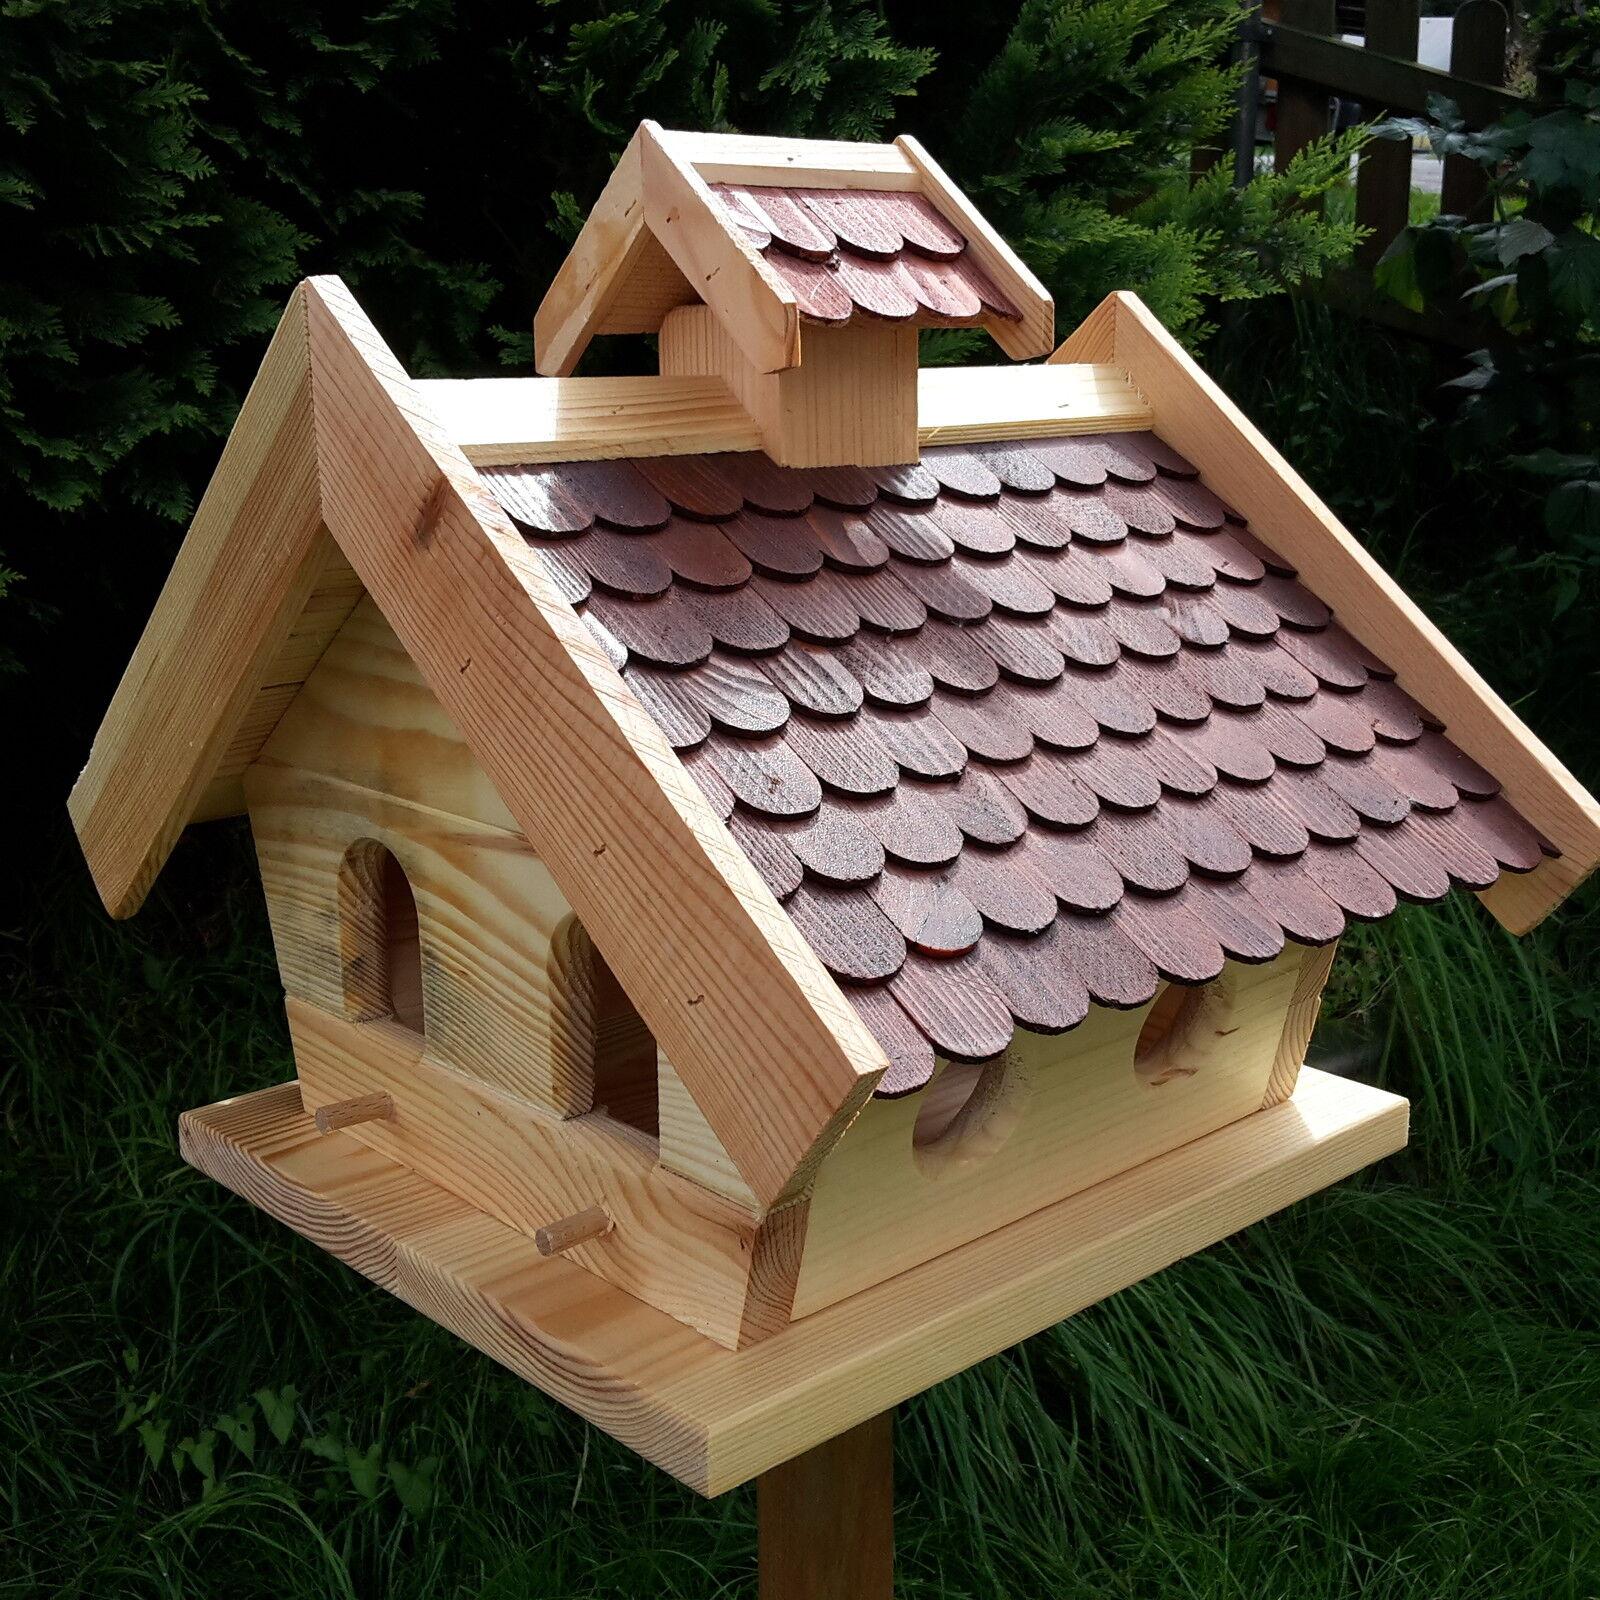 Grande casa uccelli intonaco becco mangime per uccelli Casa Uccelli CASE Legno Uccelli Casetta ufficiali